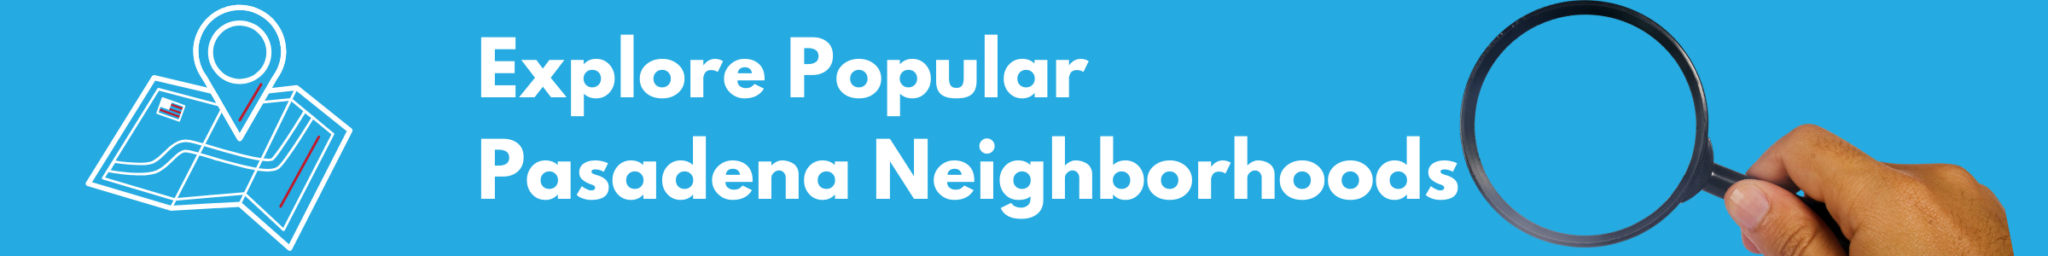 Popular Pasadena Neighborhoods